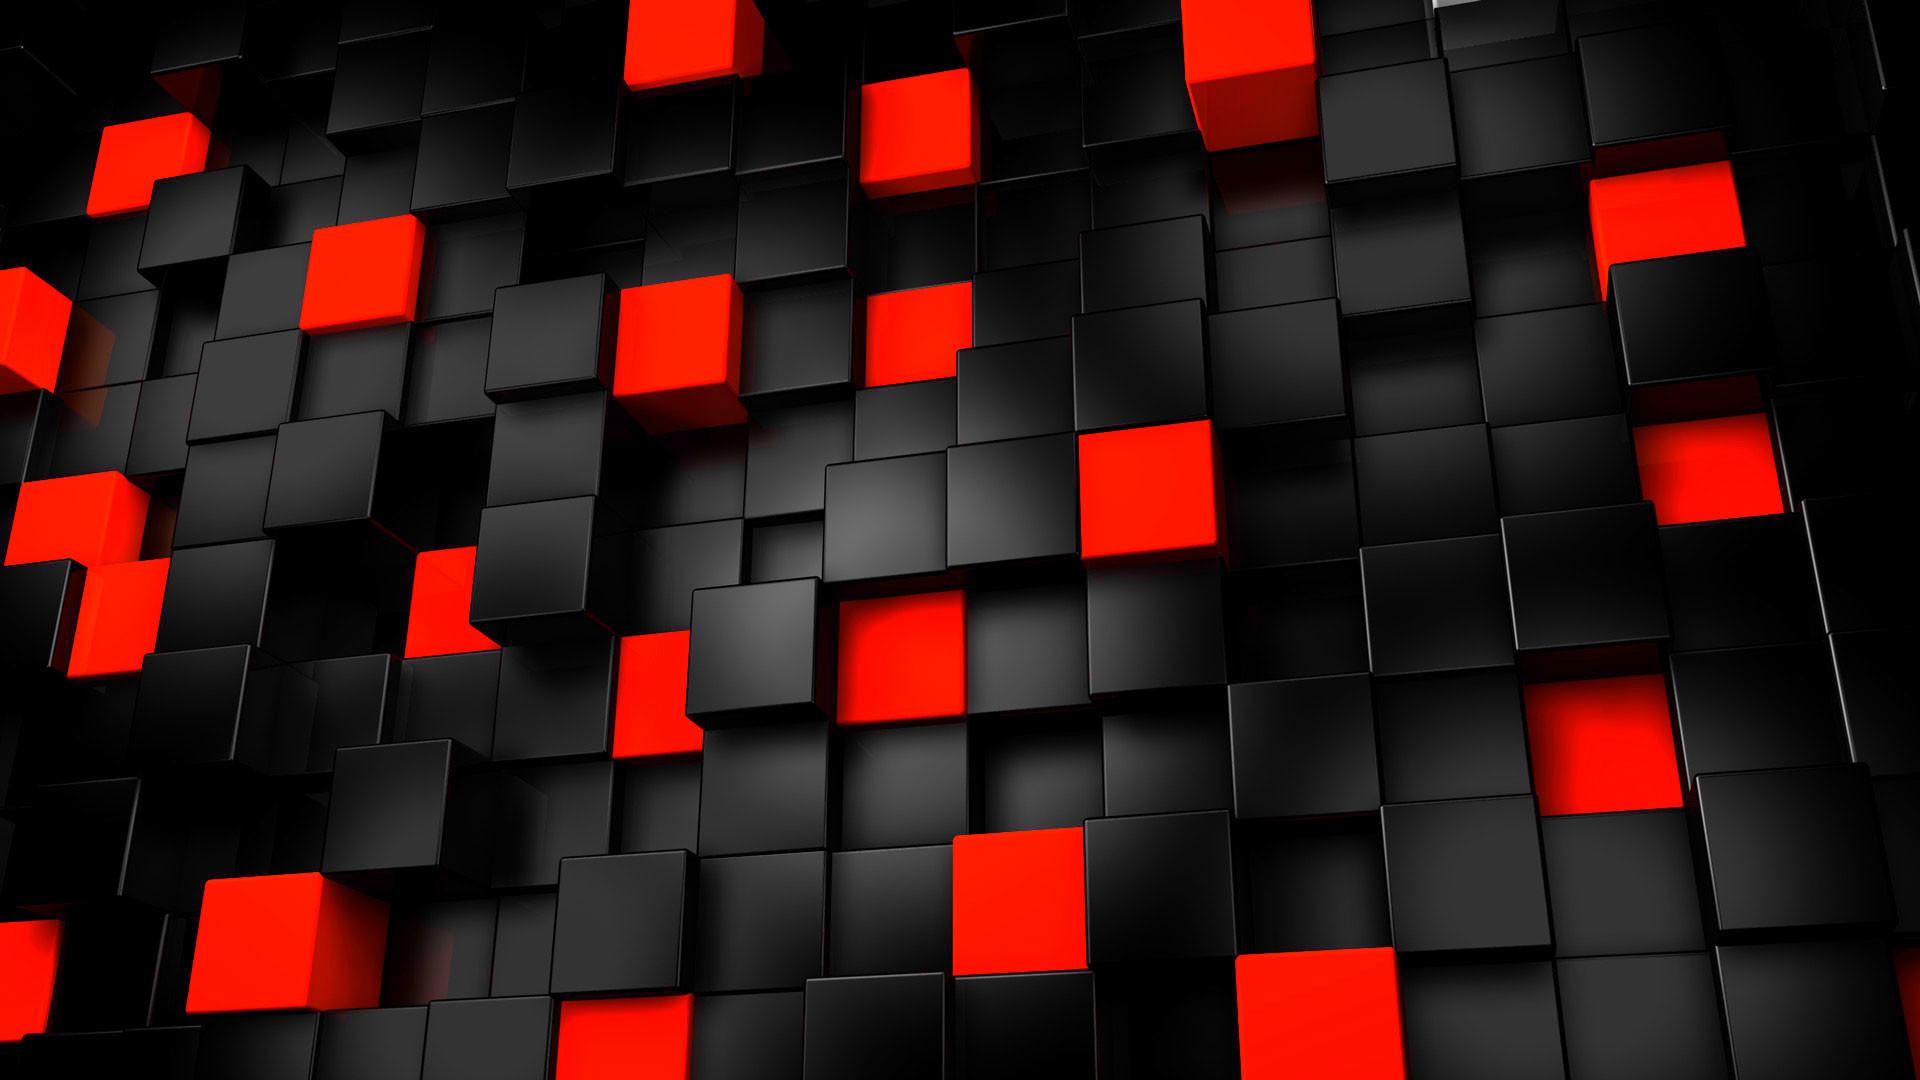 hd pics photos red and black technology blocks desktop background wallpaper